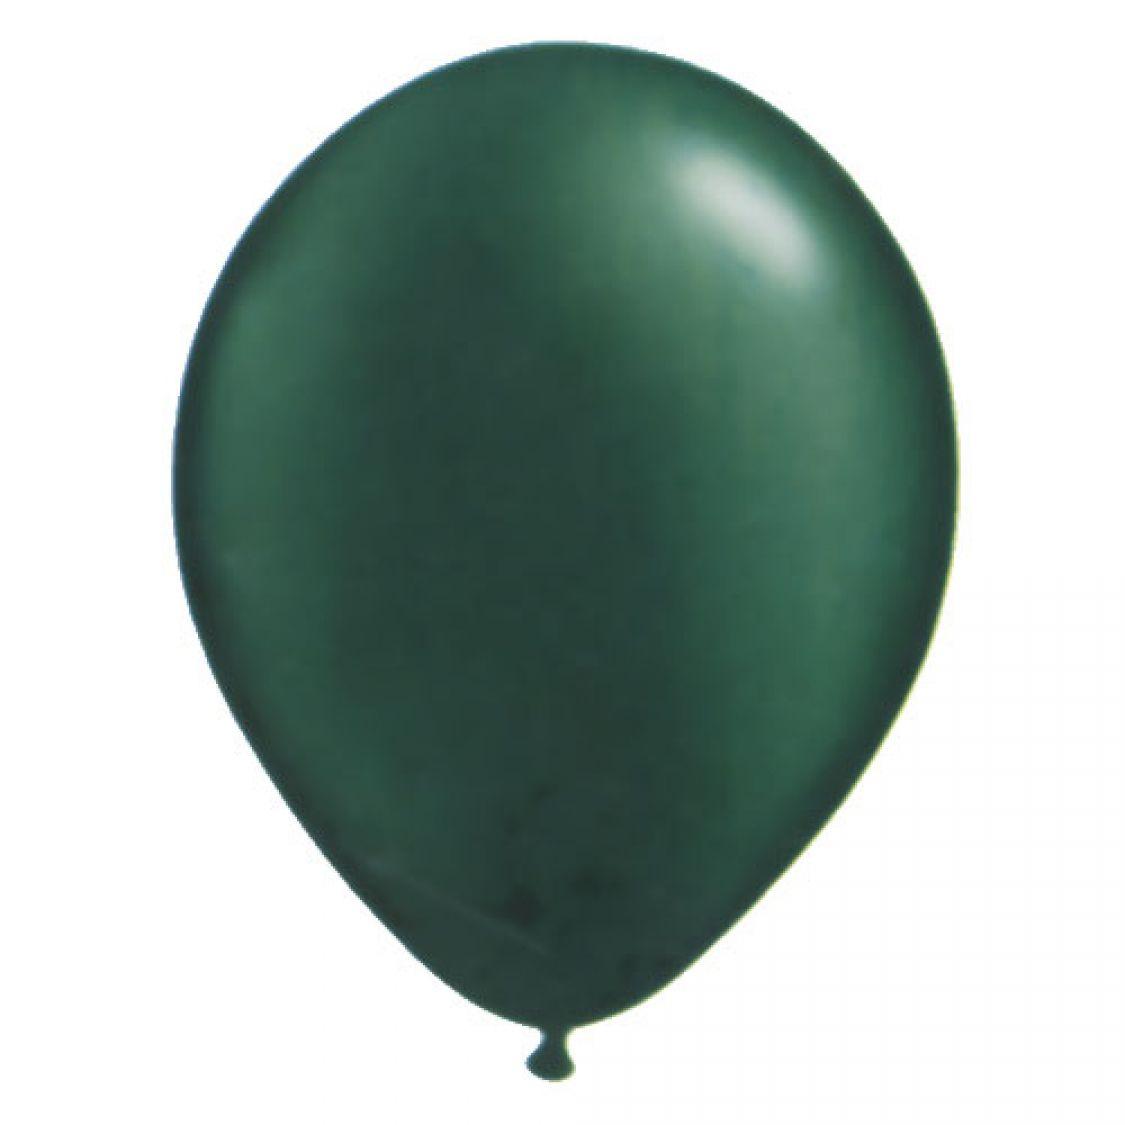 couleurs perl s pastel radiant qualatex ballon vert sapin. Black Bedroom Furniture Sets. Home Design Ideas